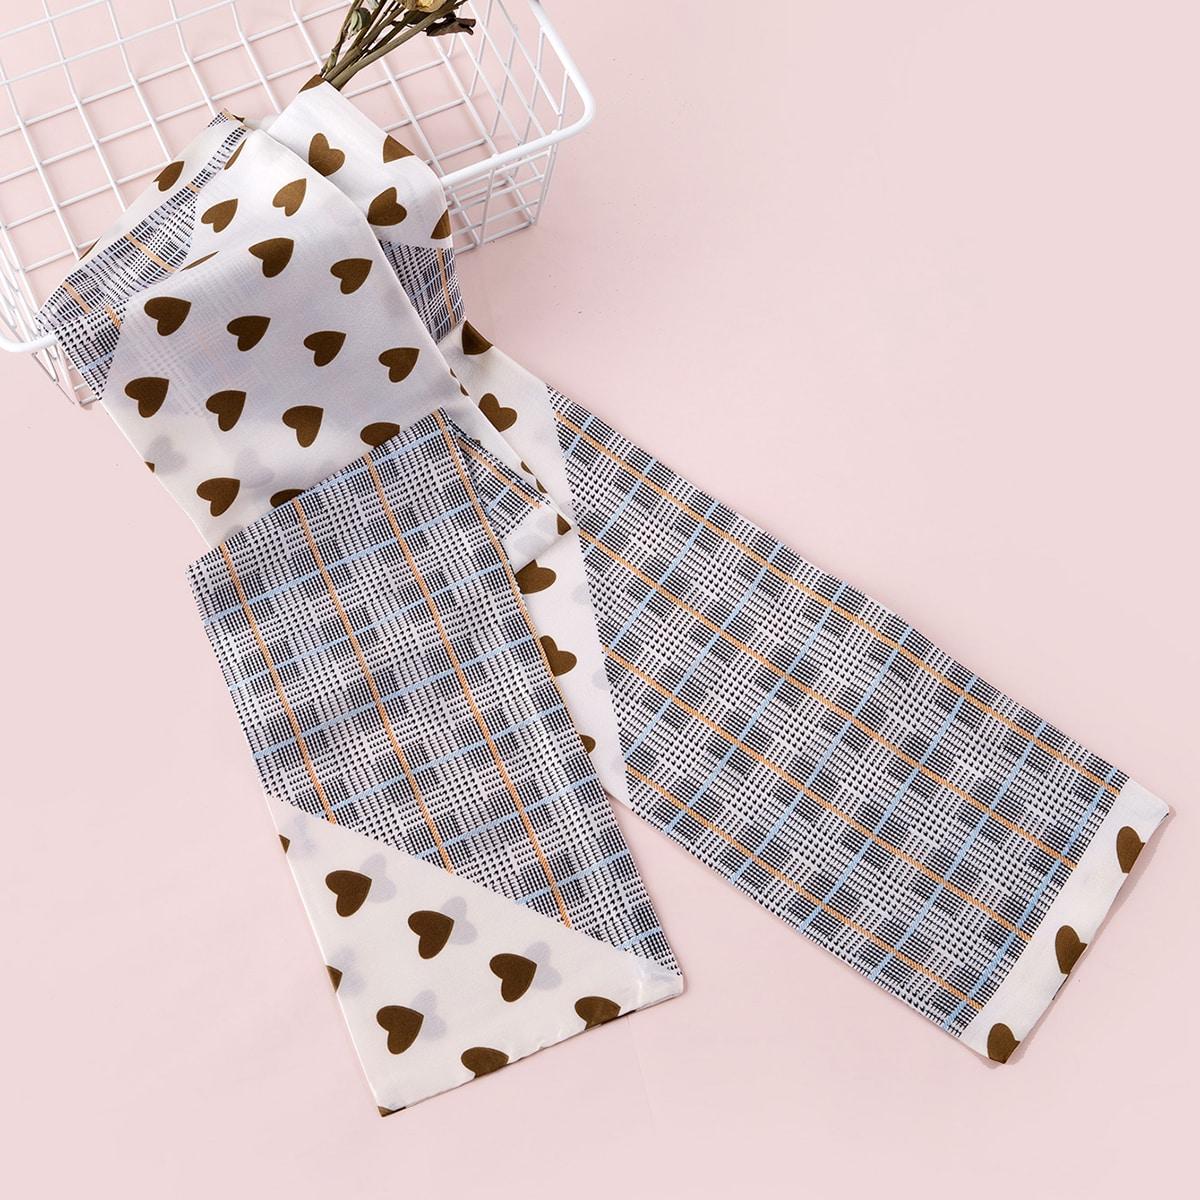 shein Hart patroon Twilly sjaal